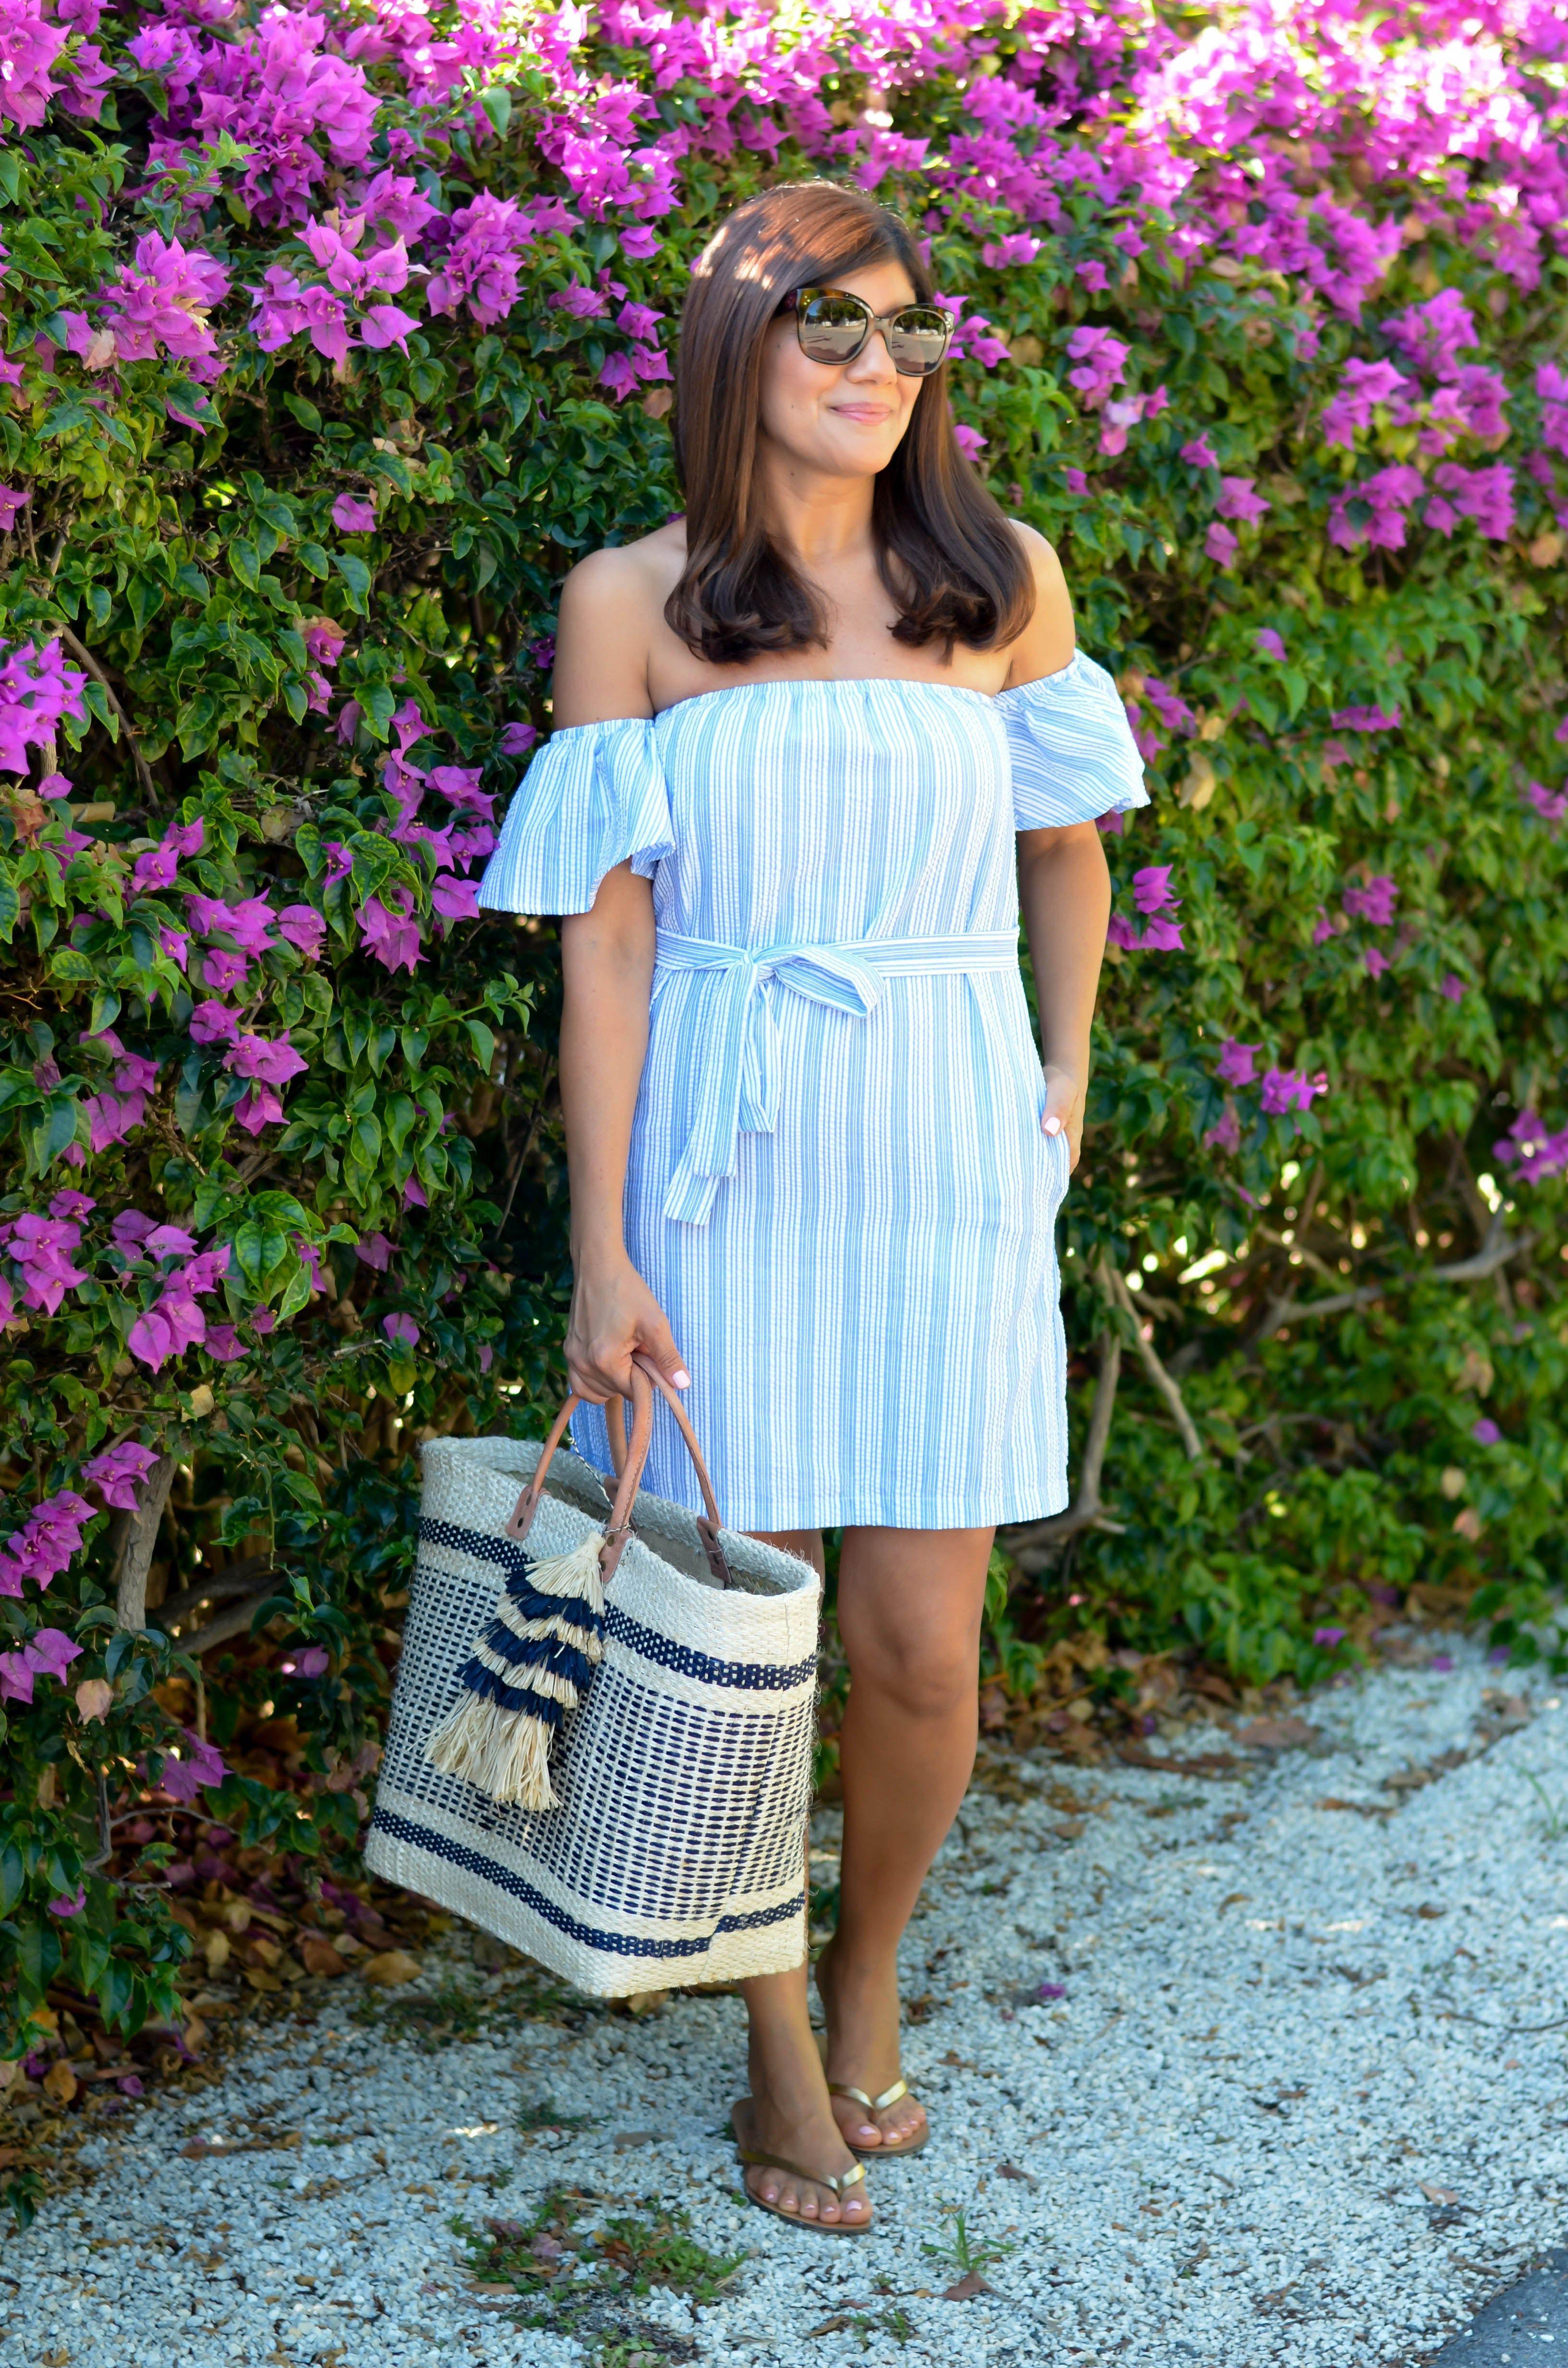 Summer Dress Series Perfect Little Vacation Dress Beautifully Seaside Summer Dresses Vacation Dresses Dresses [ 4928 x 3264 Pixel ]